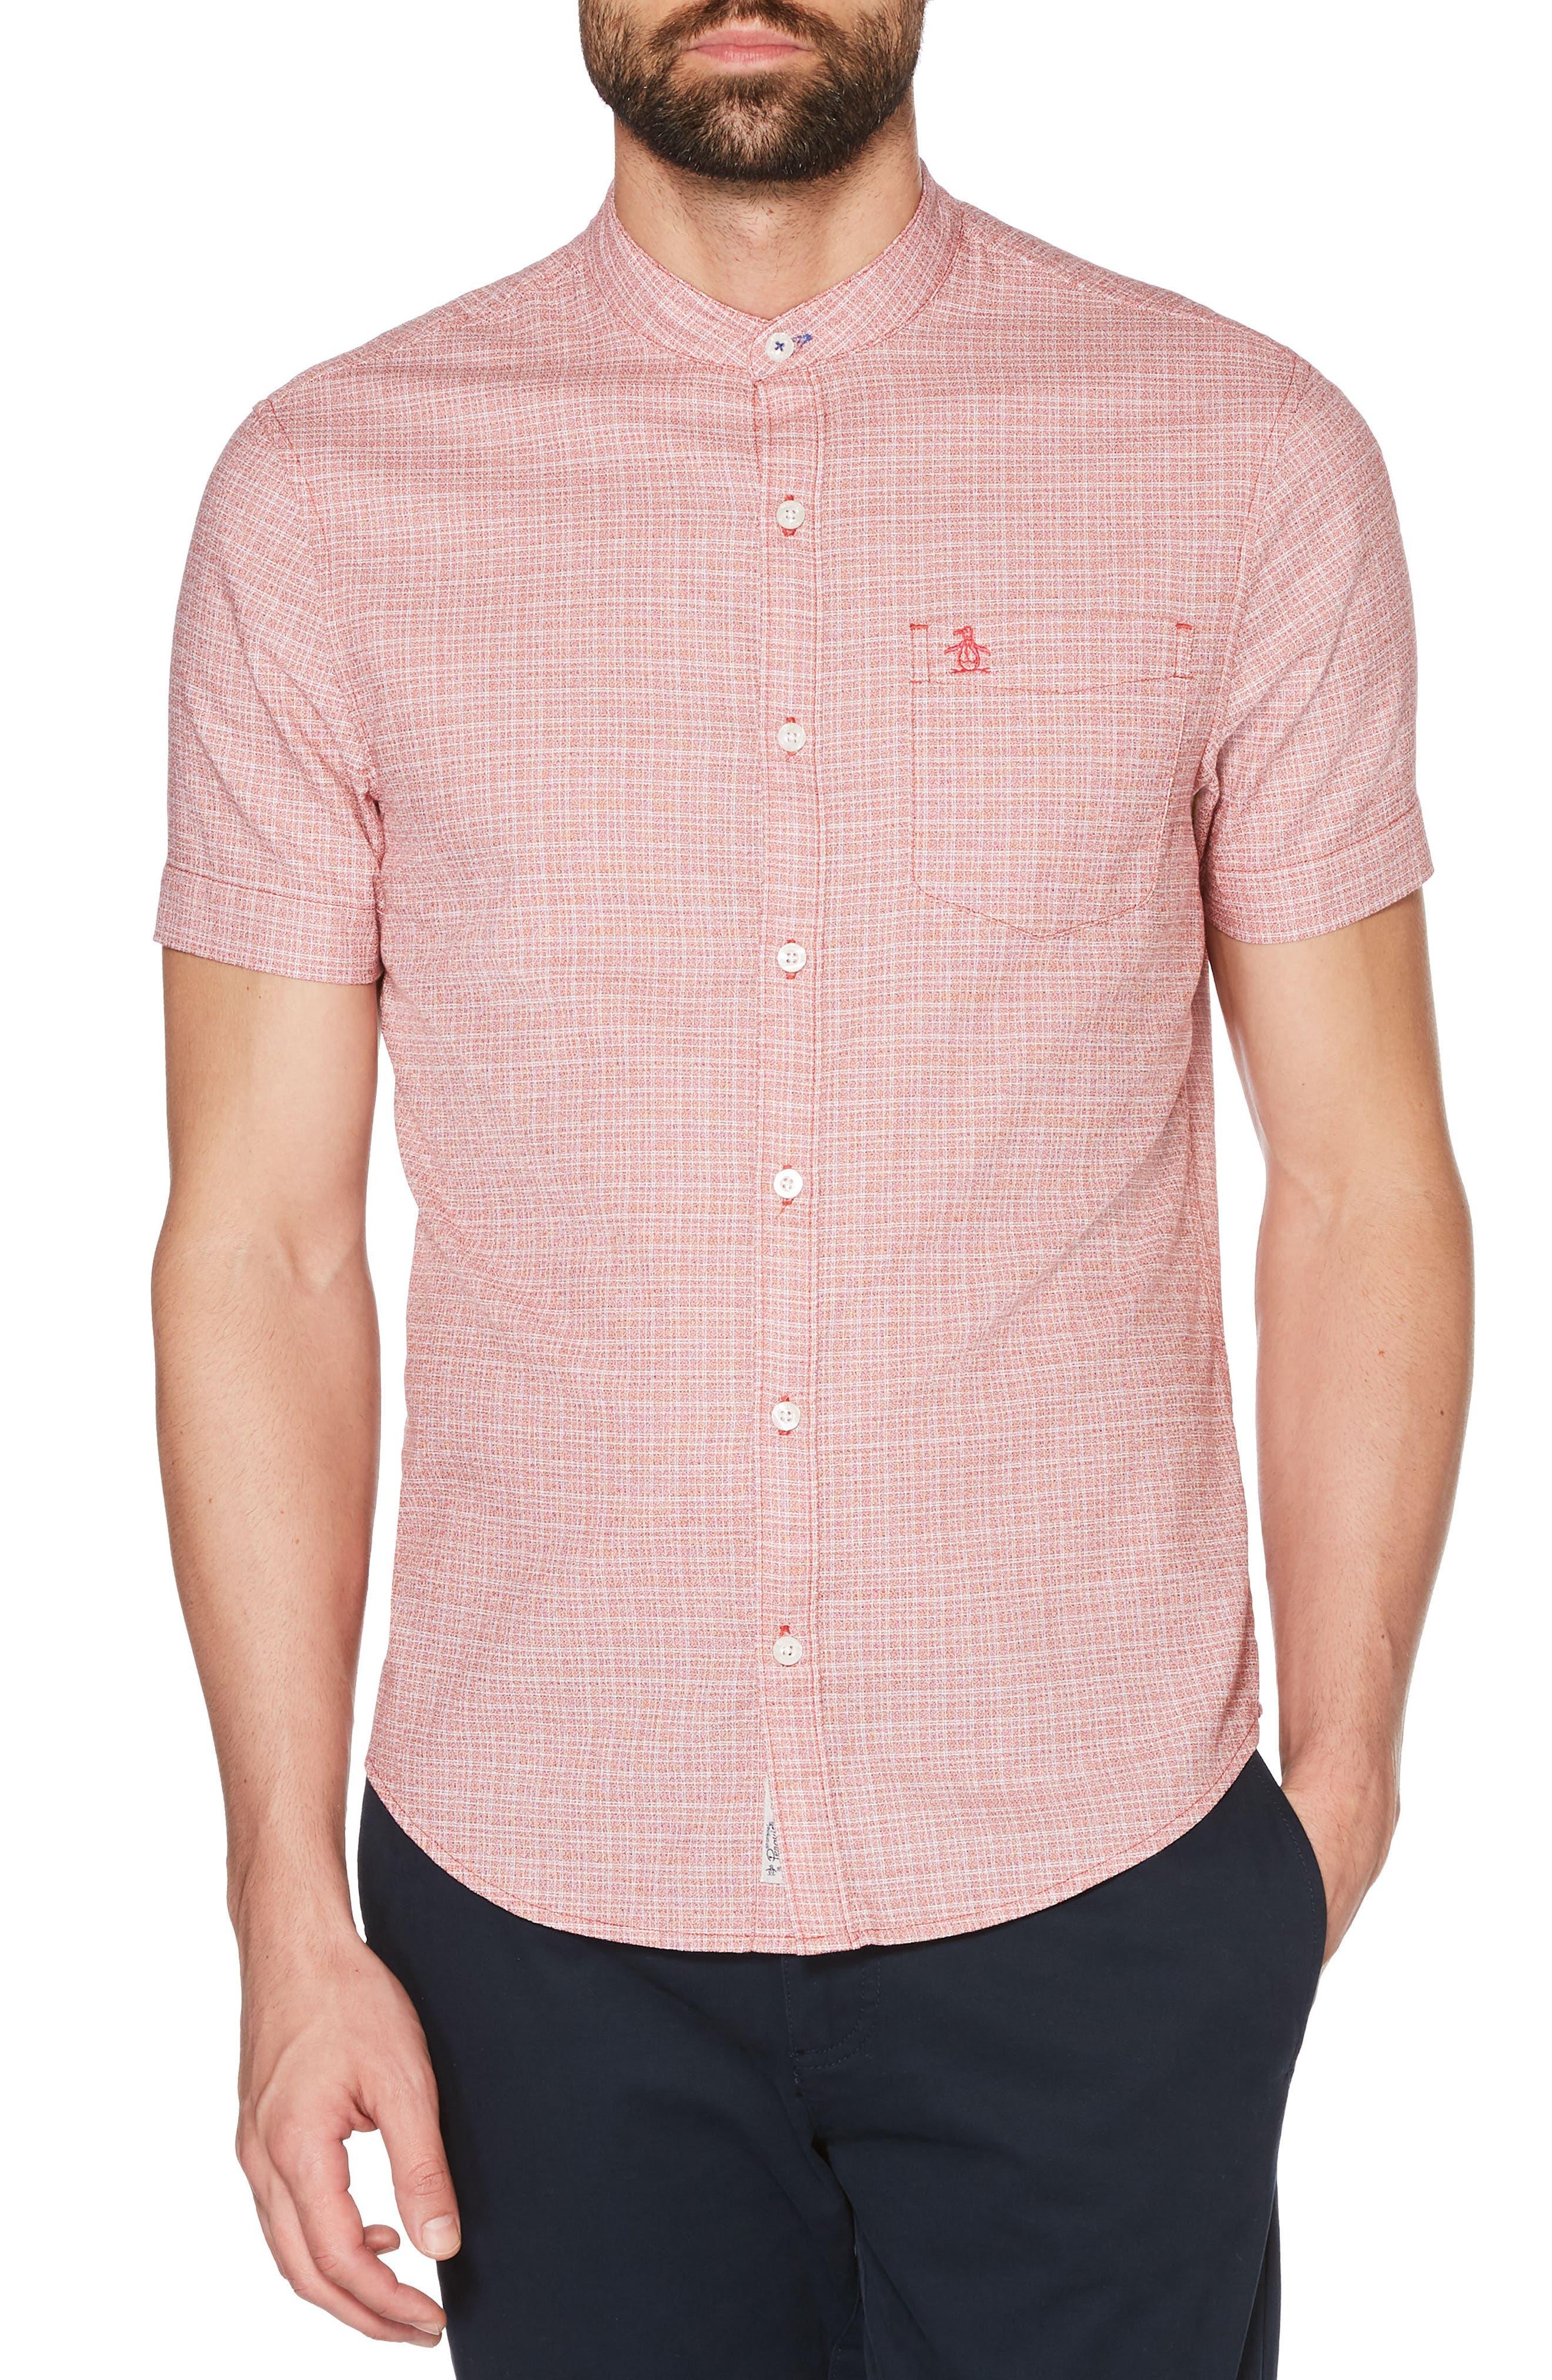 Crosshatch Shirt,                         Main,                         color, 660